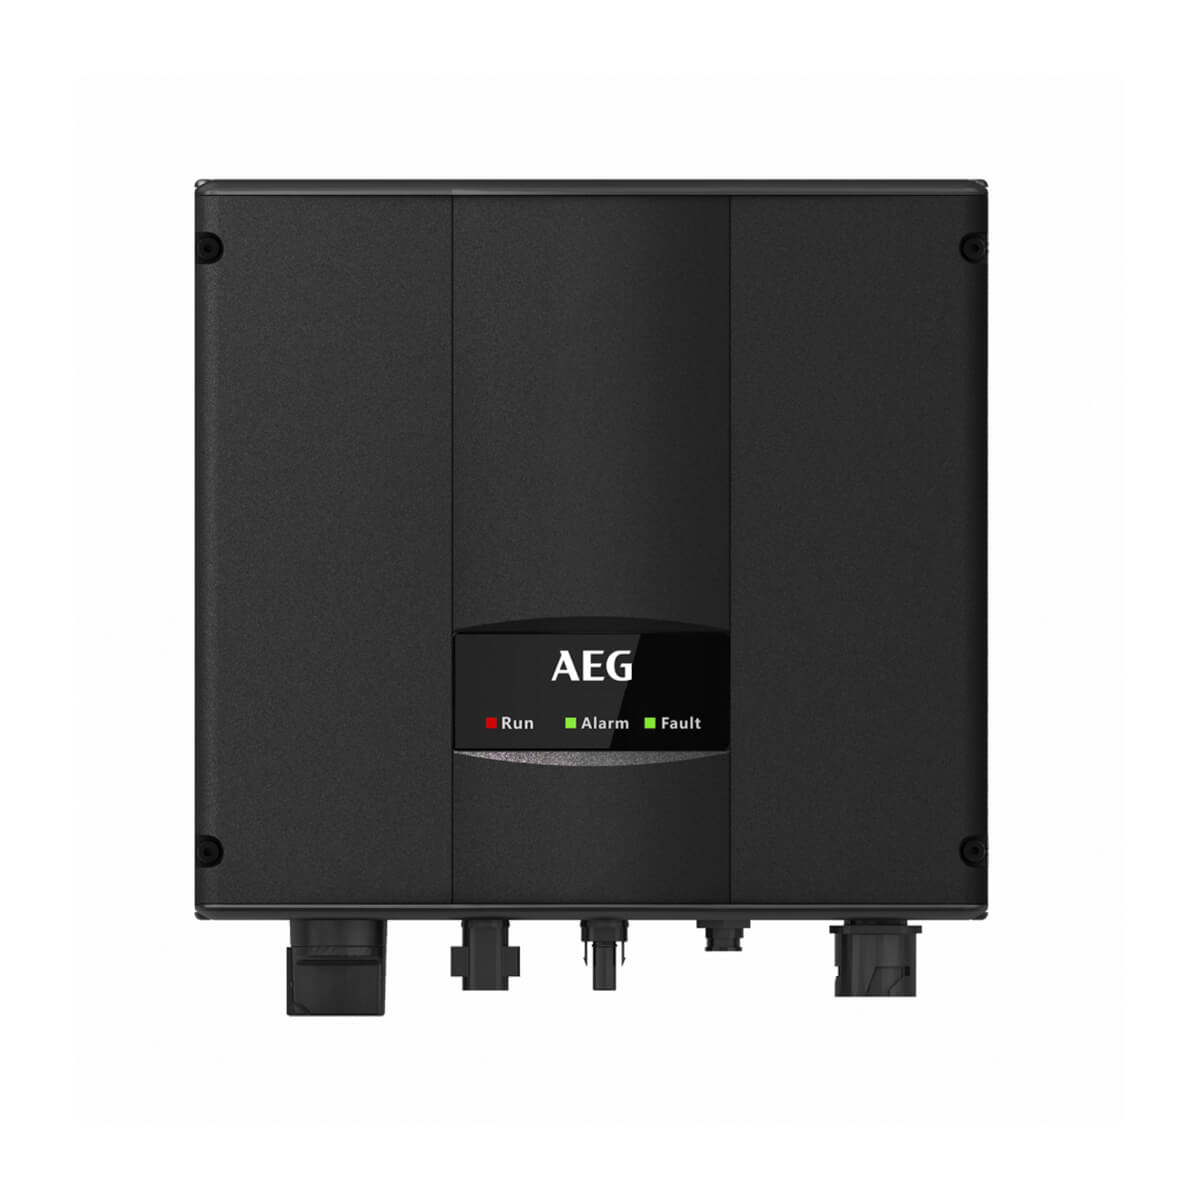 aeg 2kW inverter, aeg as-ir01 2kW inverter, aeg as-ir01-2000 inverter, aeg as-ir01-2000, aeg as-ir01 2kW